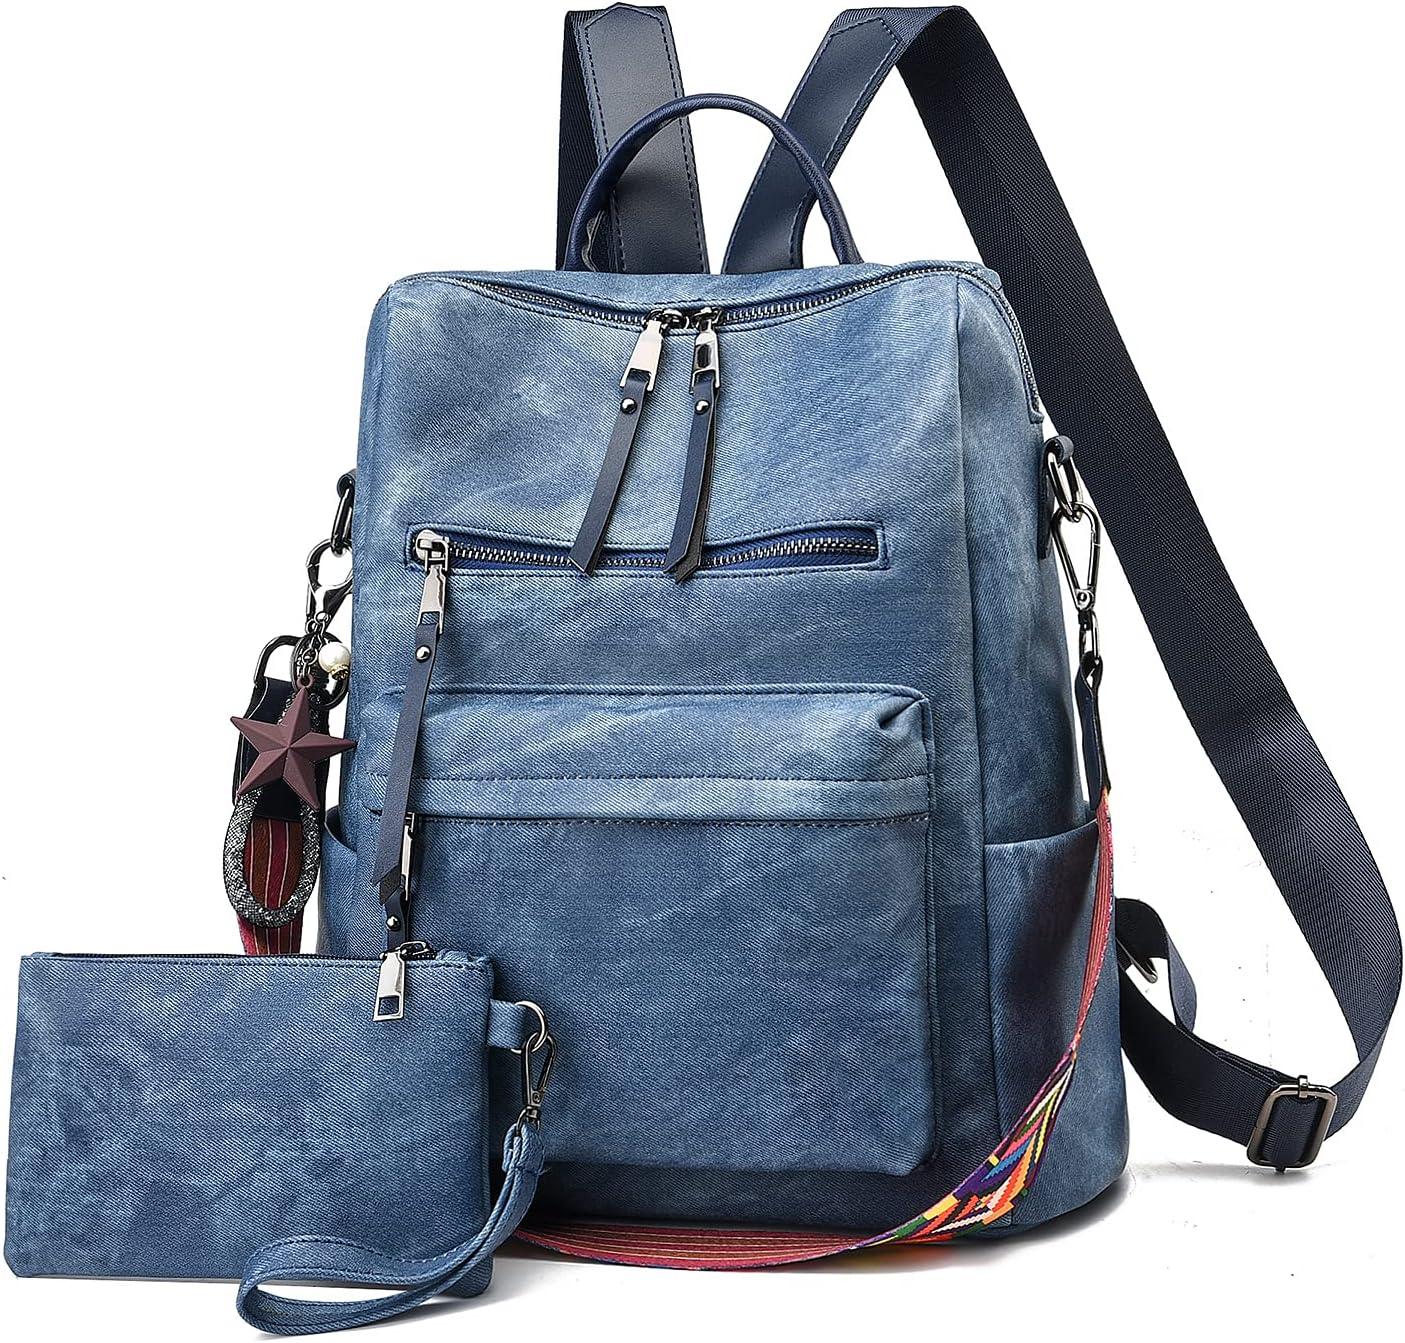 Women's Fashion Backpack Purse(2021 new)Day Packs Satchel Handbags and Shoulder Bag PU Leather Travel bag (A-denim blue)